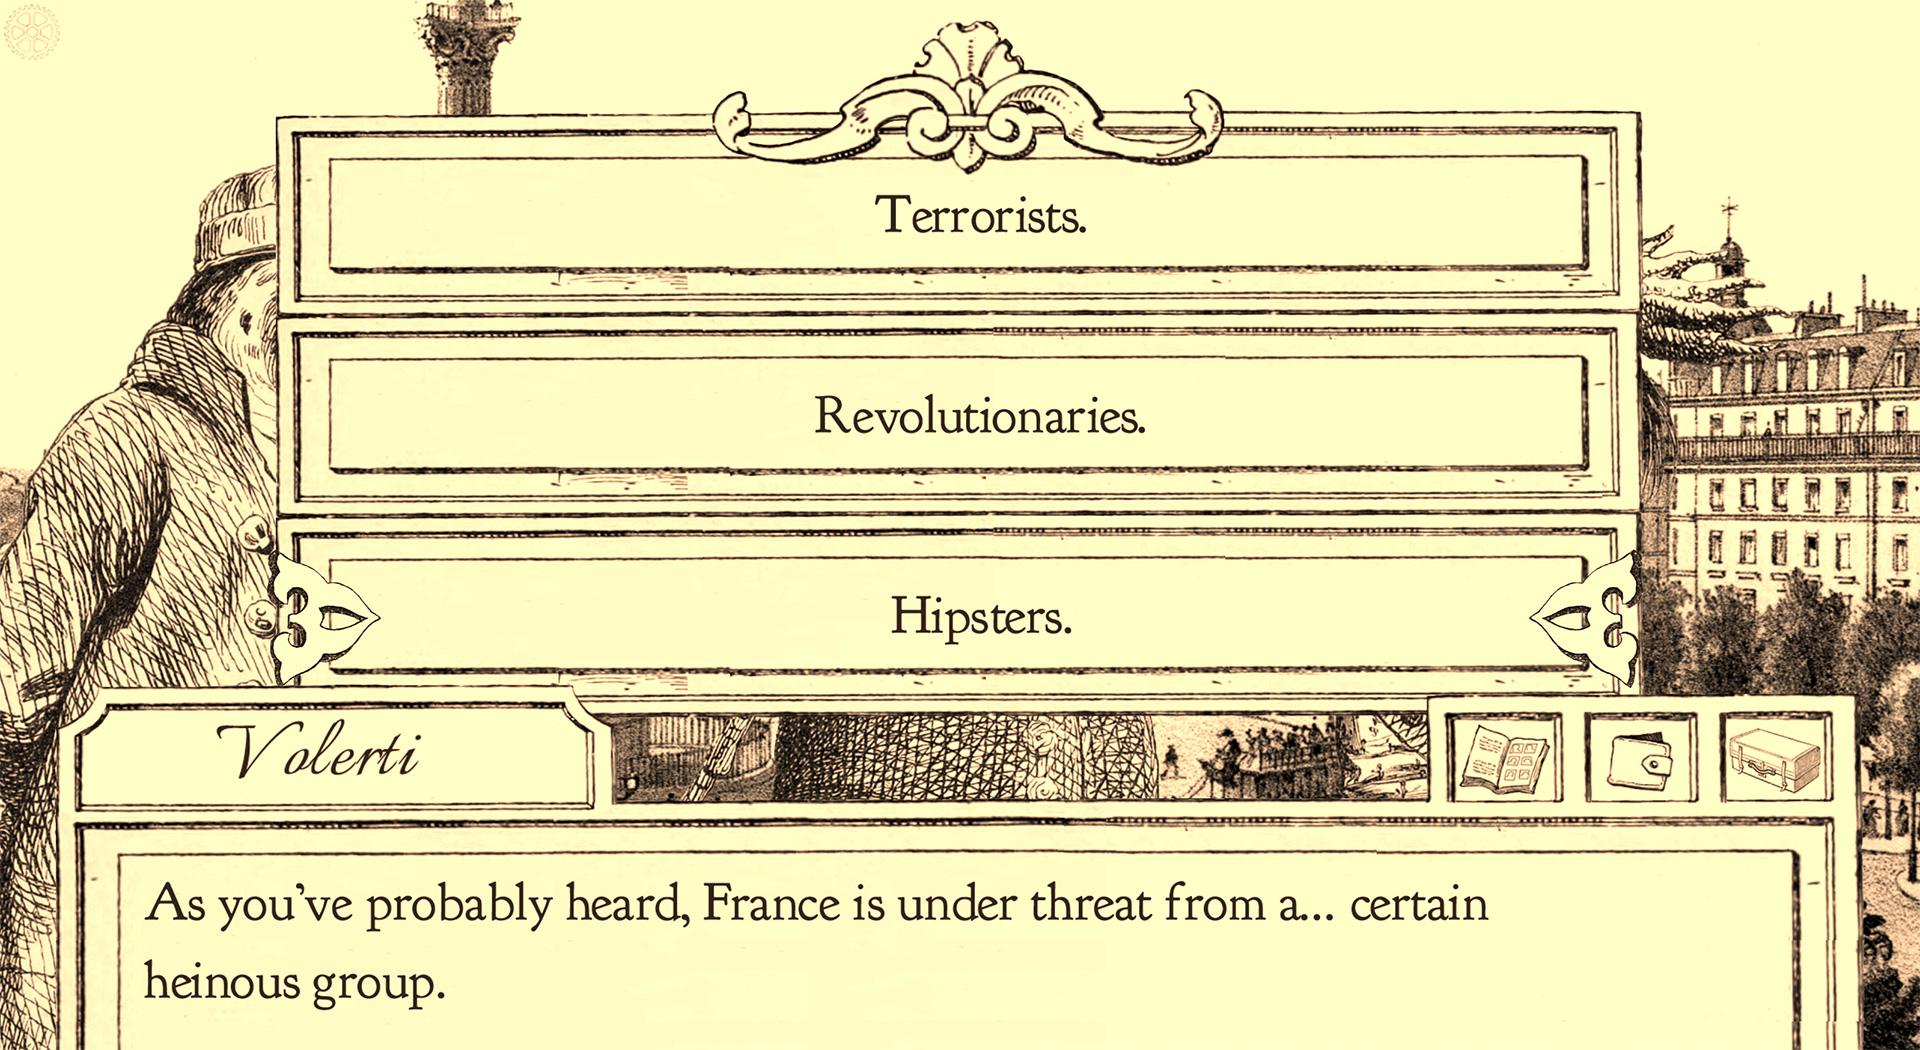 Curse those revolutionary hipster terrorists!